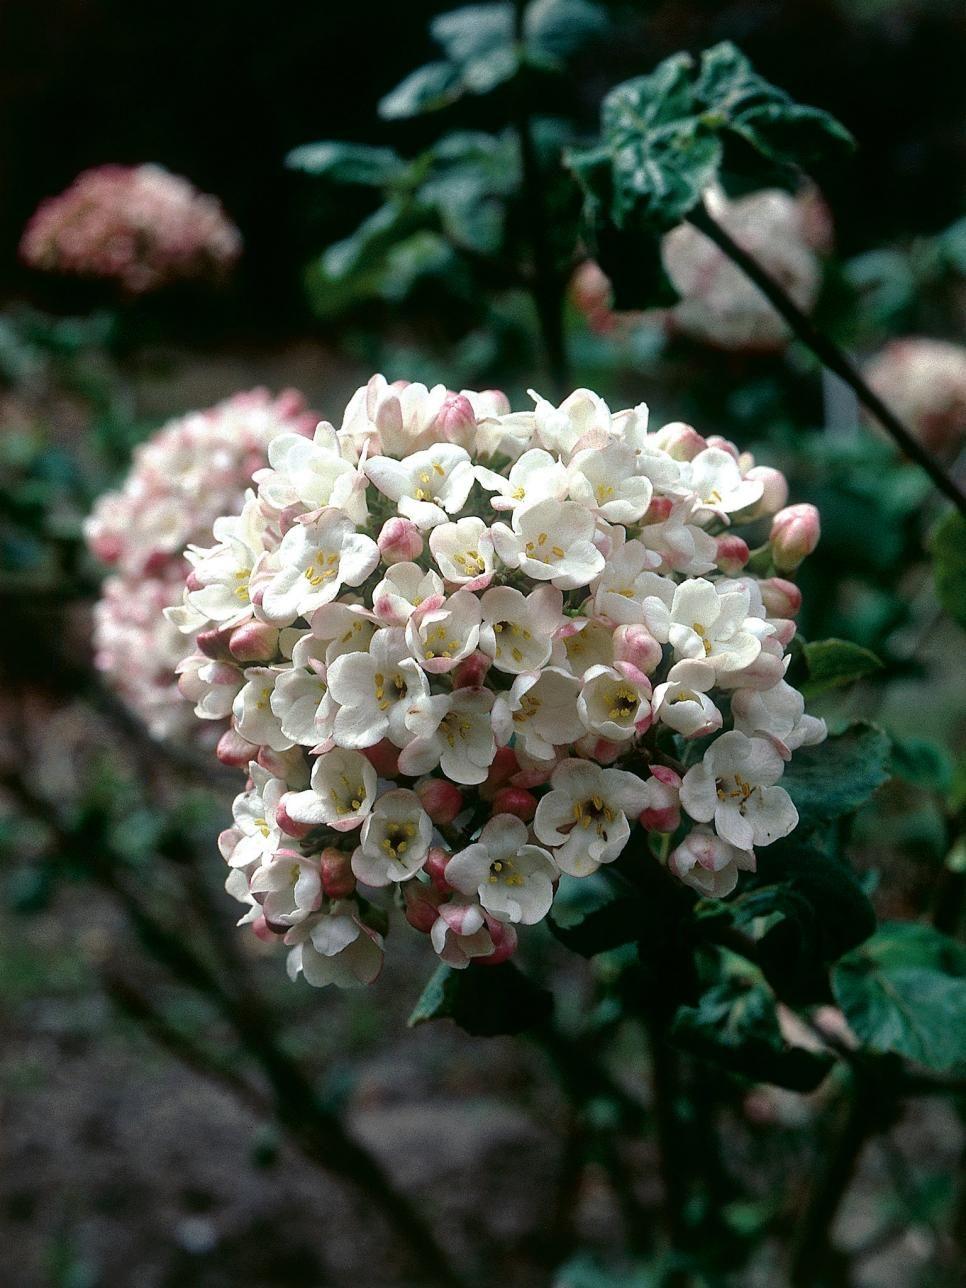 Shade Tolerant Flowering Shrubs: Shade-Tolerant Plants For Woodland Gardens